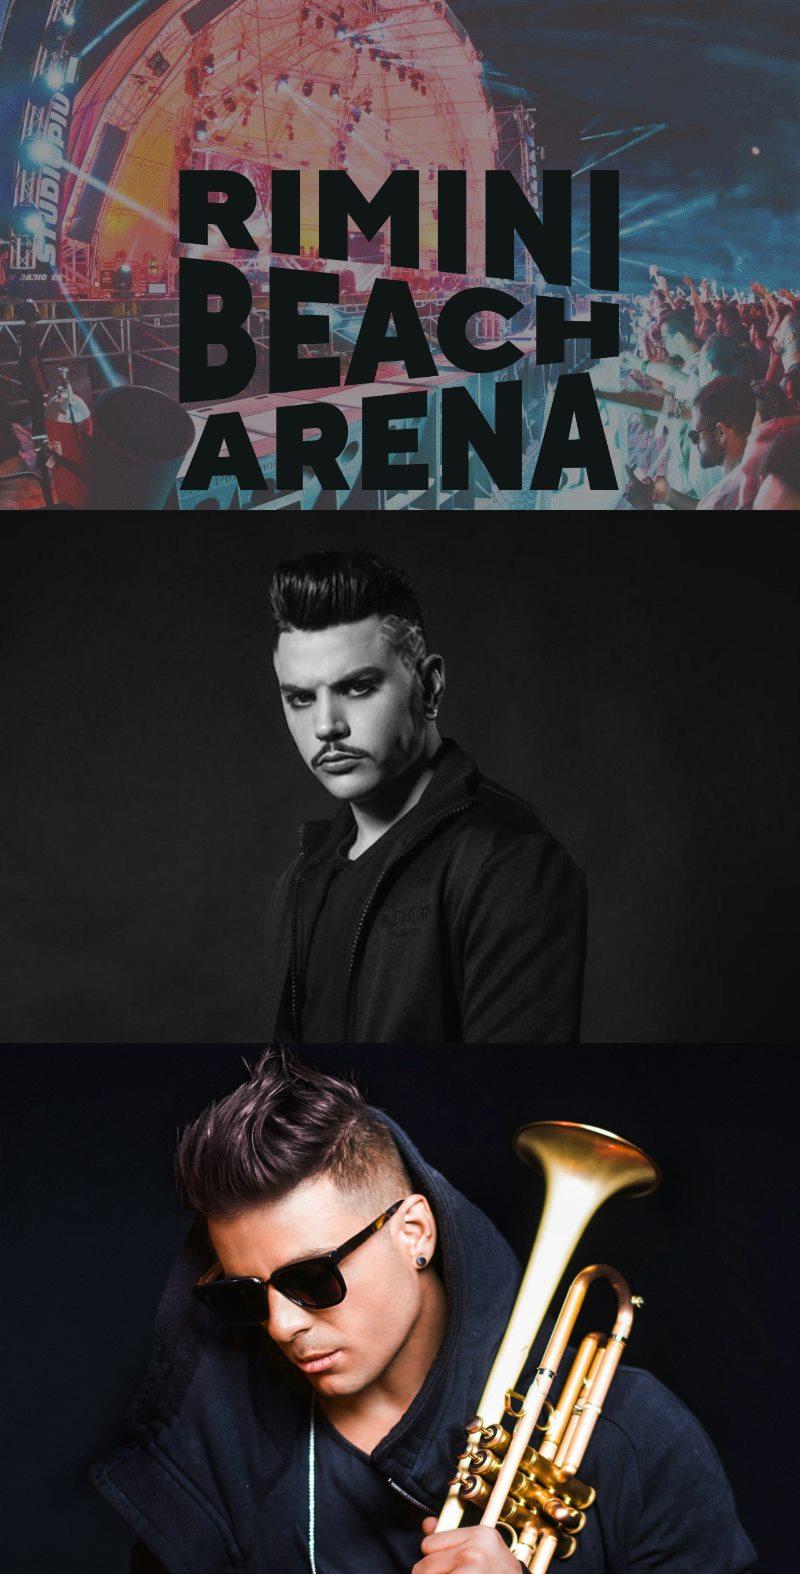 Rimini Beach Arena: Izi e Timmy Trumpet